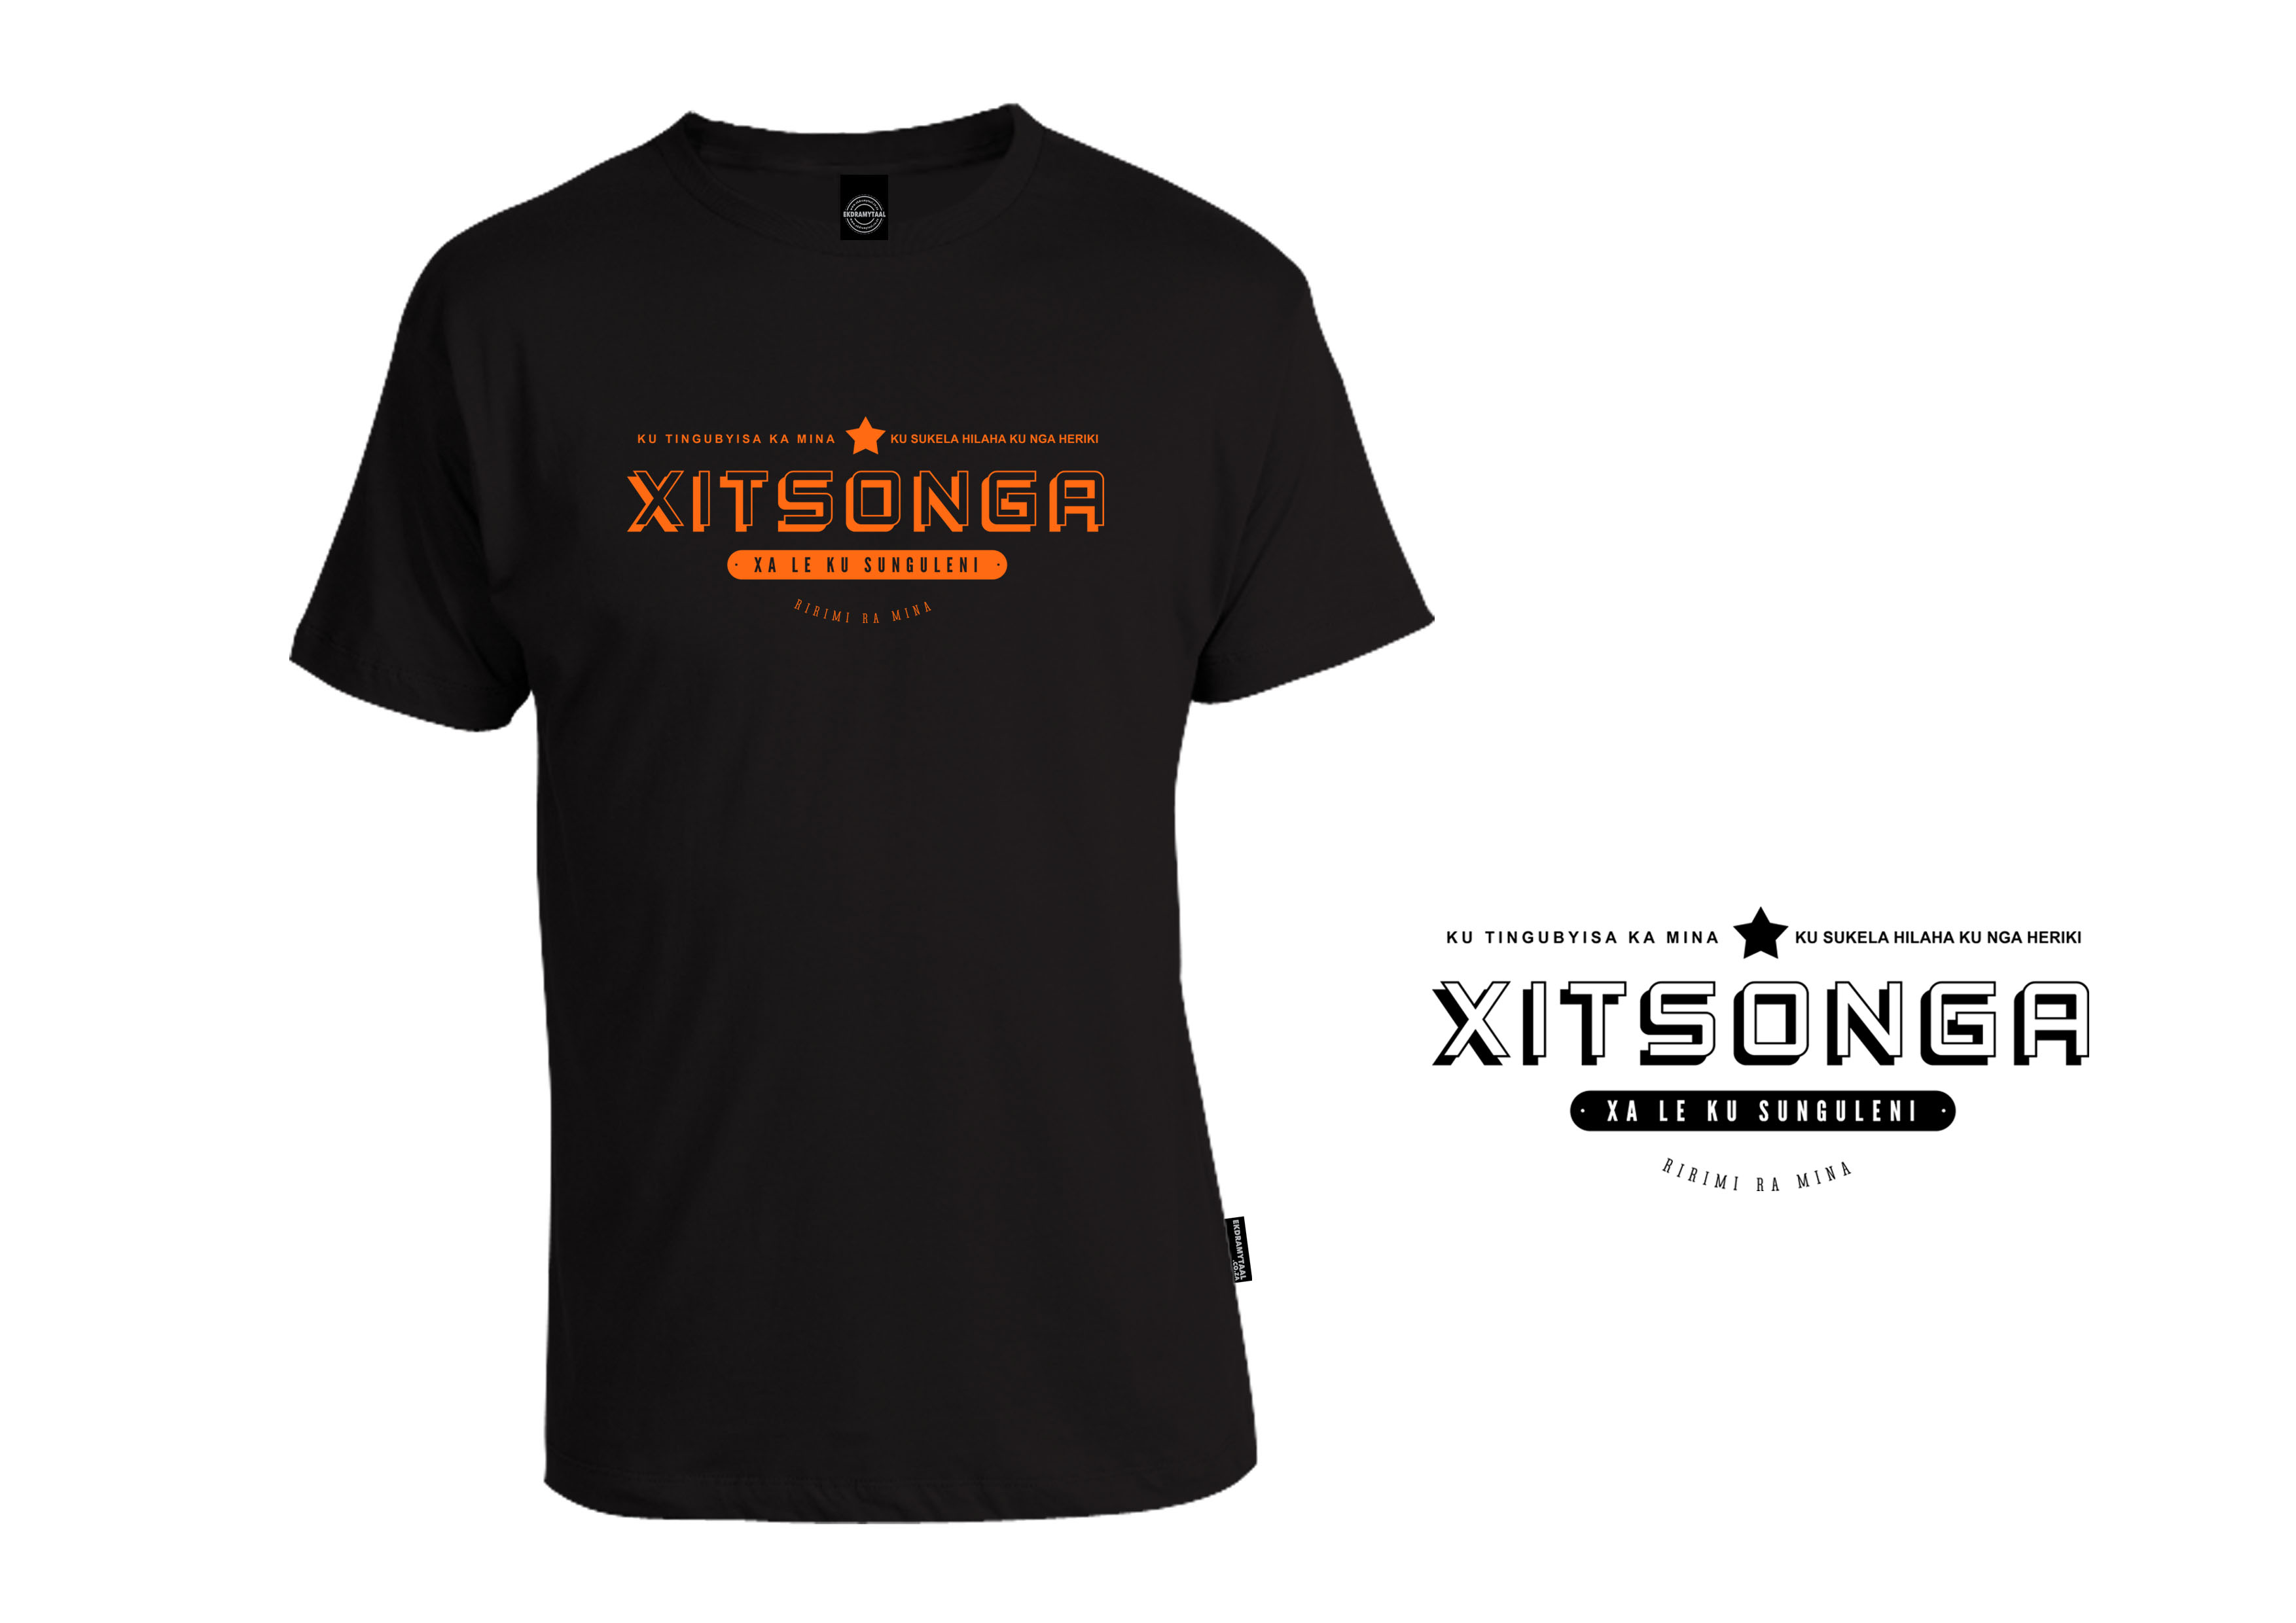 XITSONGA - XIT001